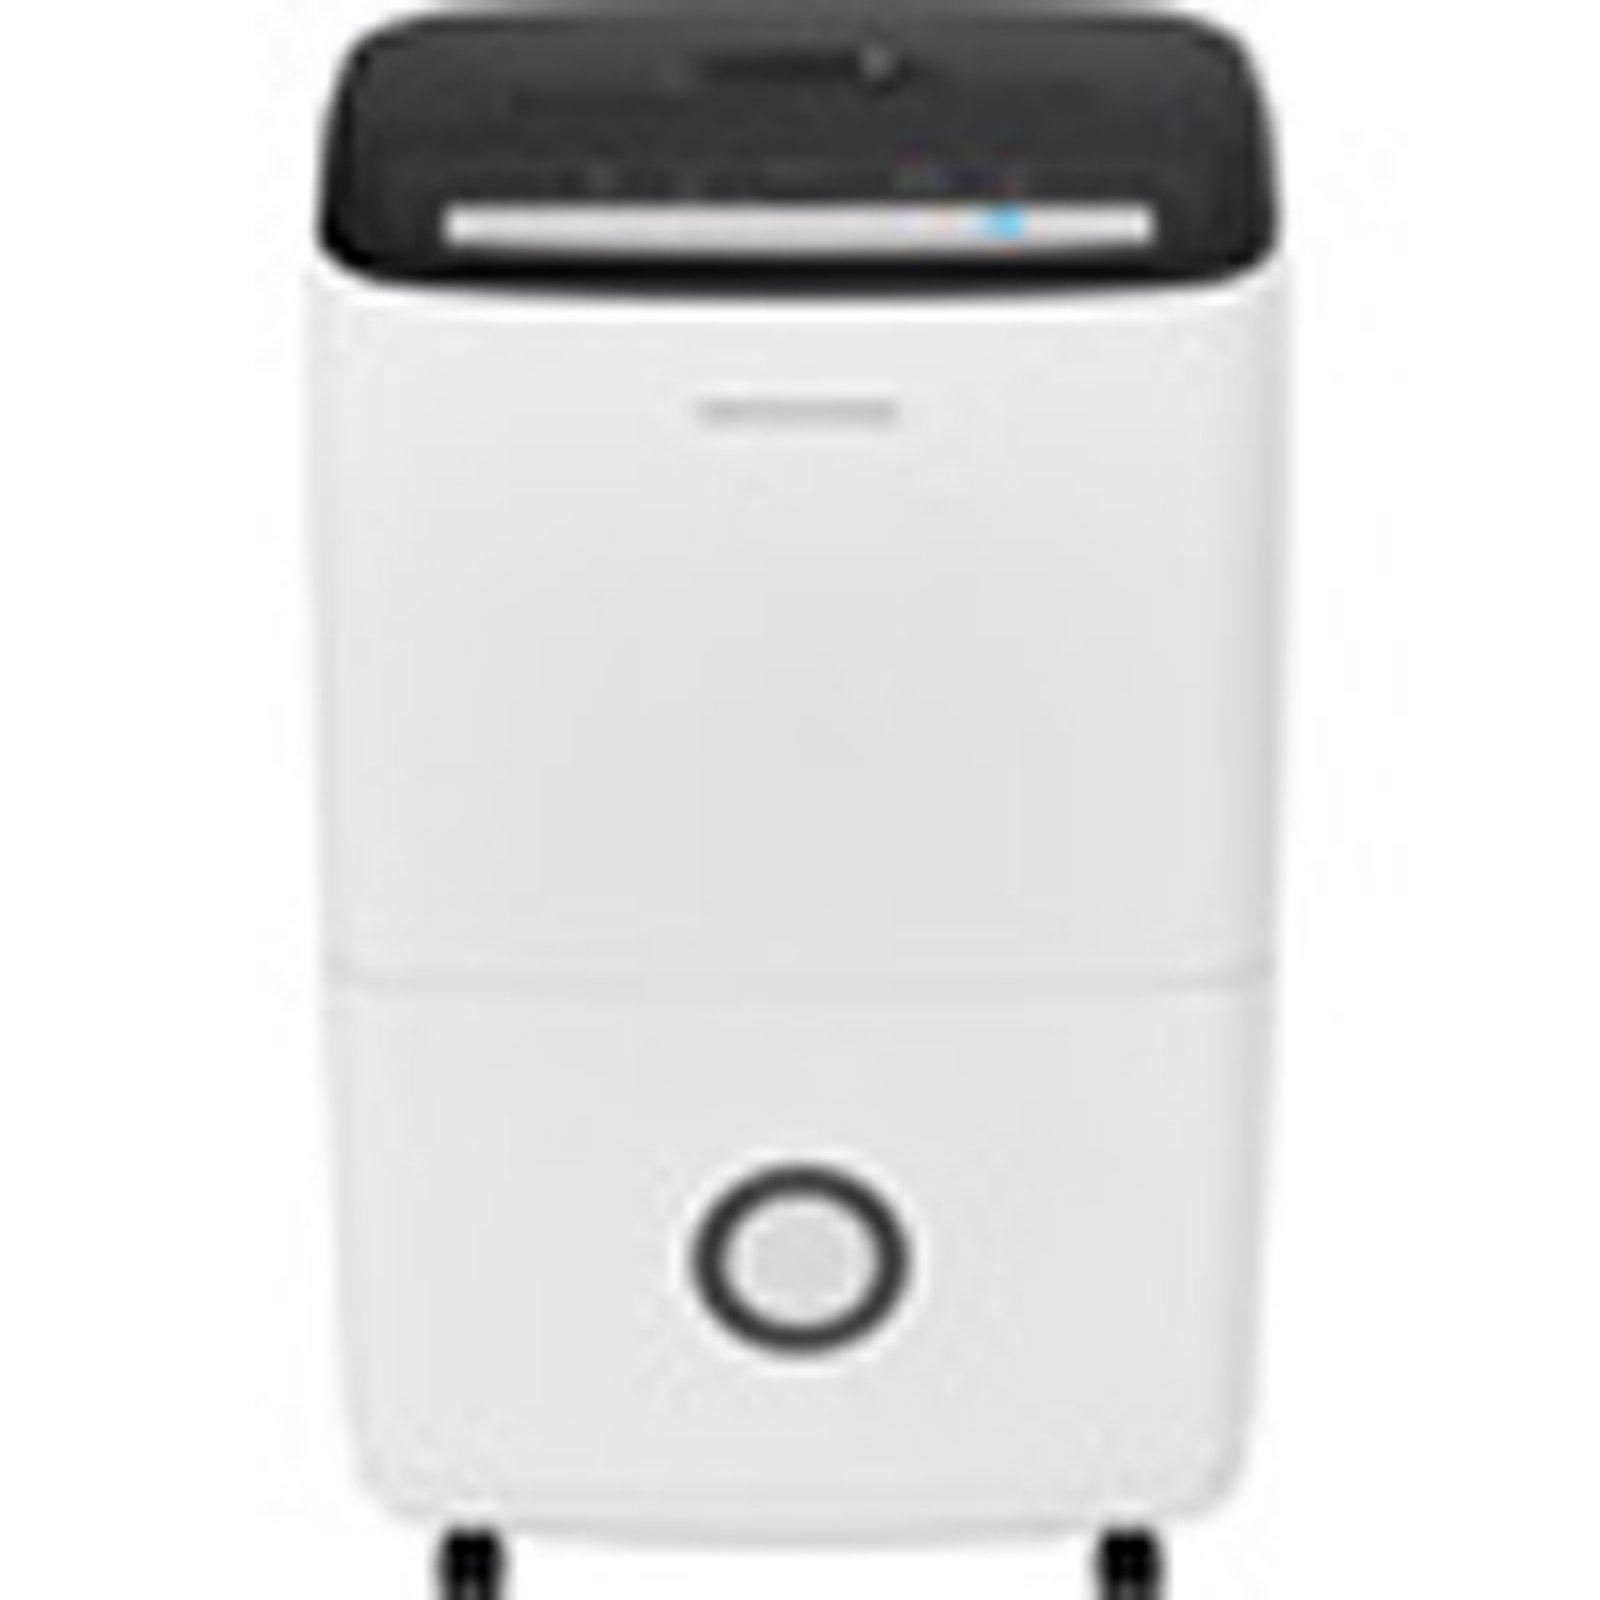 Walmart Frigidaire 50-Pint Dehumidifier frigidaire 70-pint dehumidifier with built-in pump, white - walmart